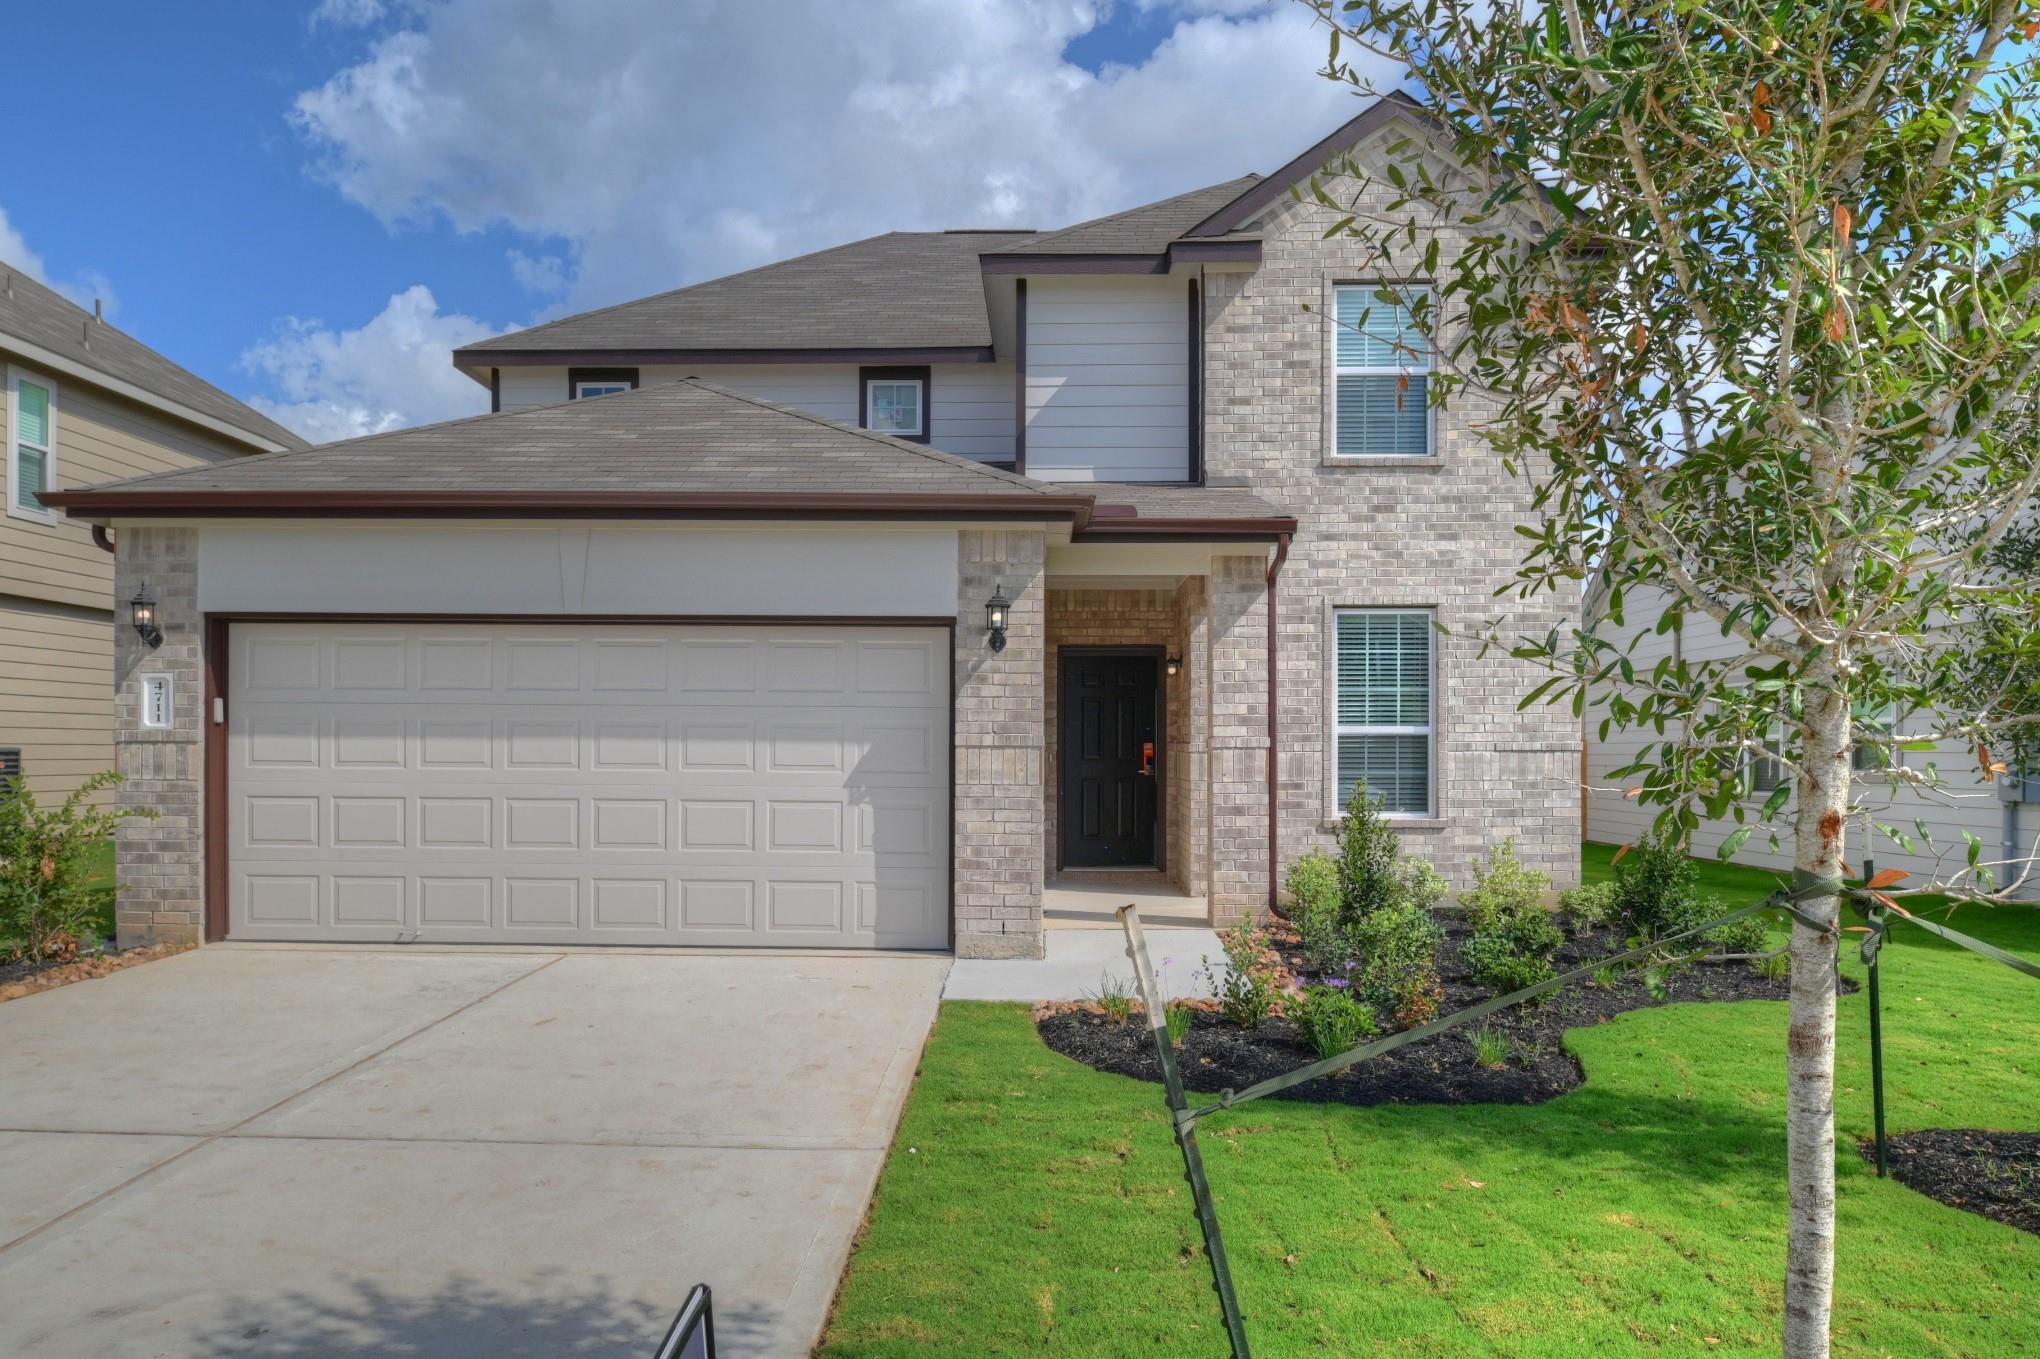 4711 Los Pines Way Property Photo - Bryan, TX real estate listing